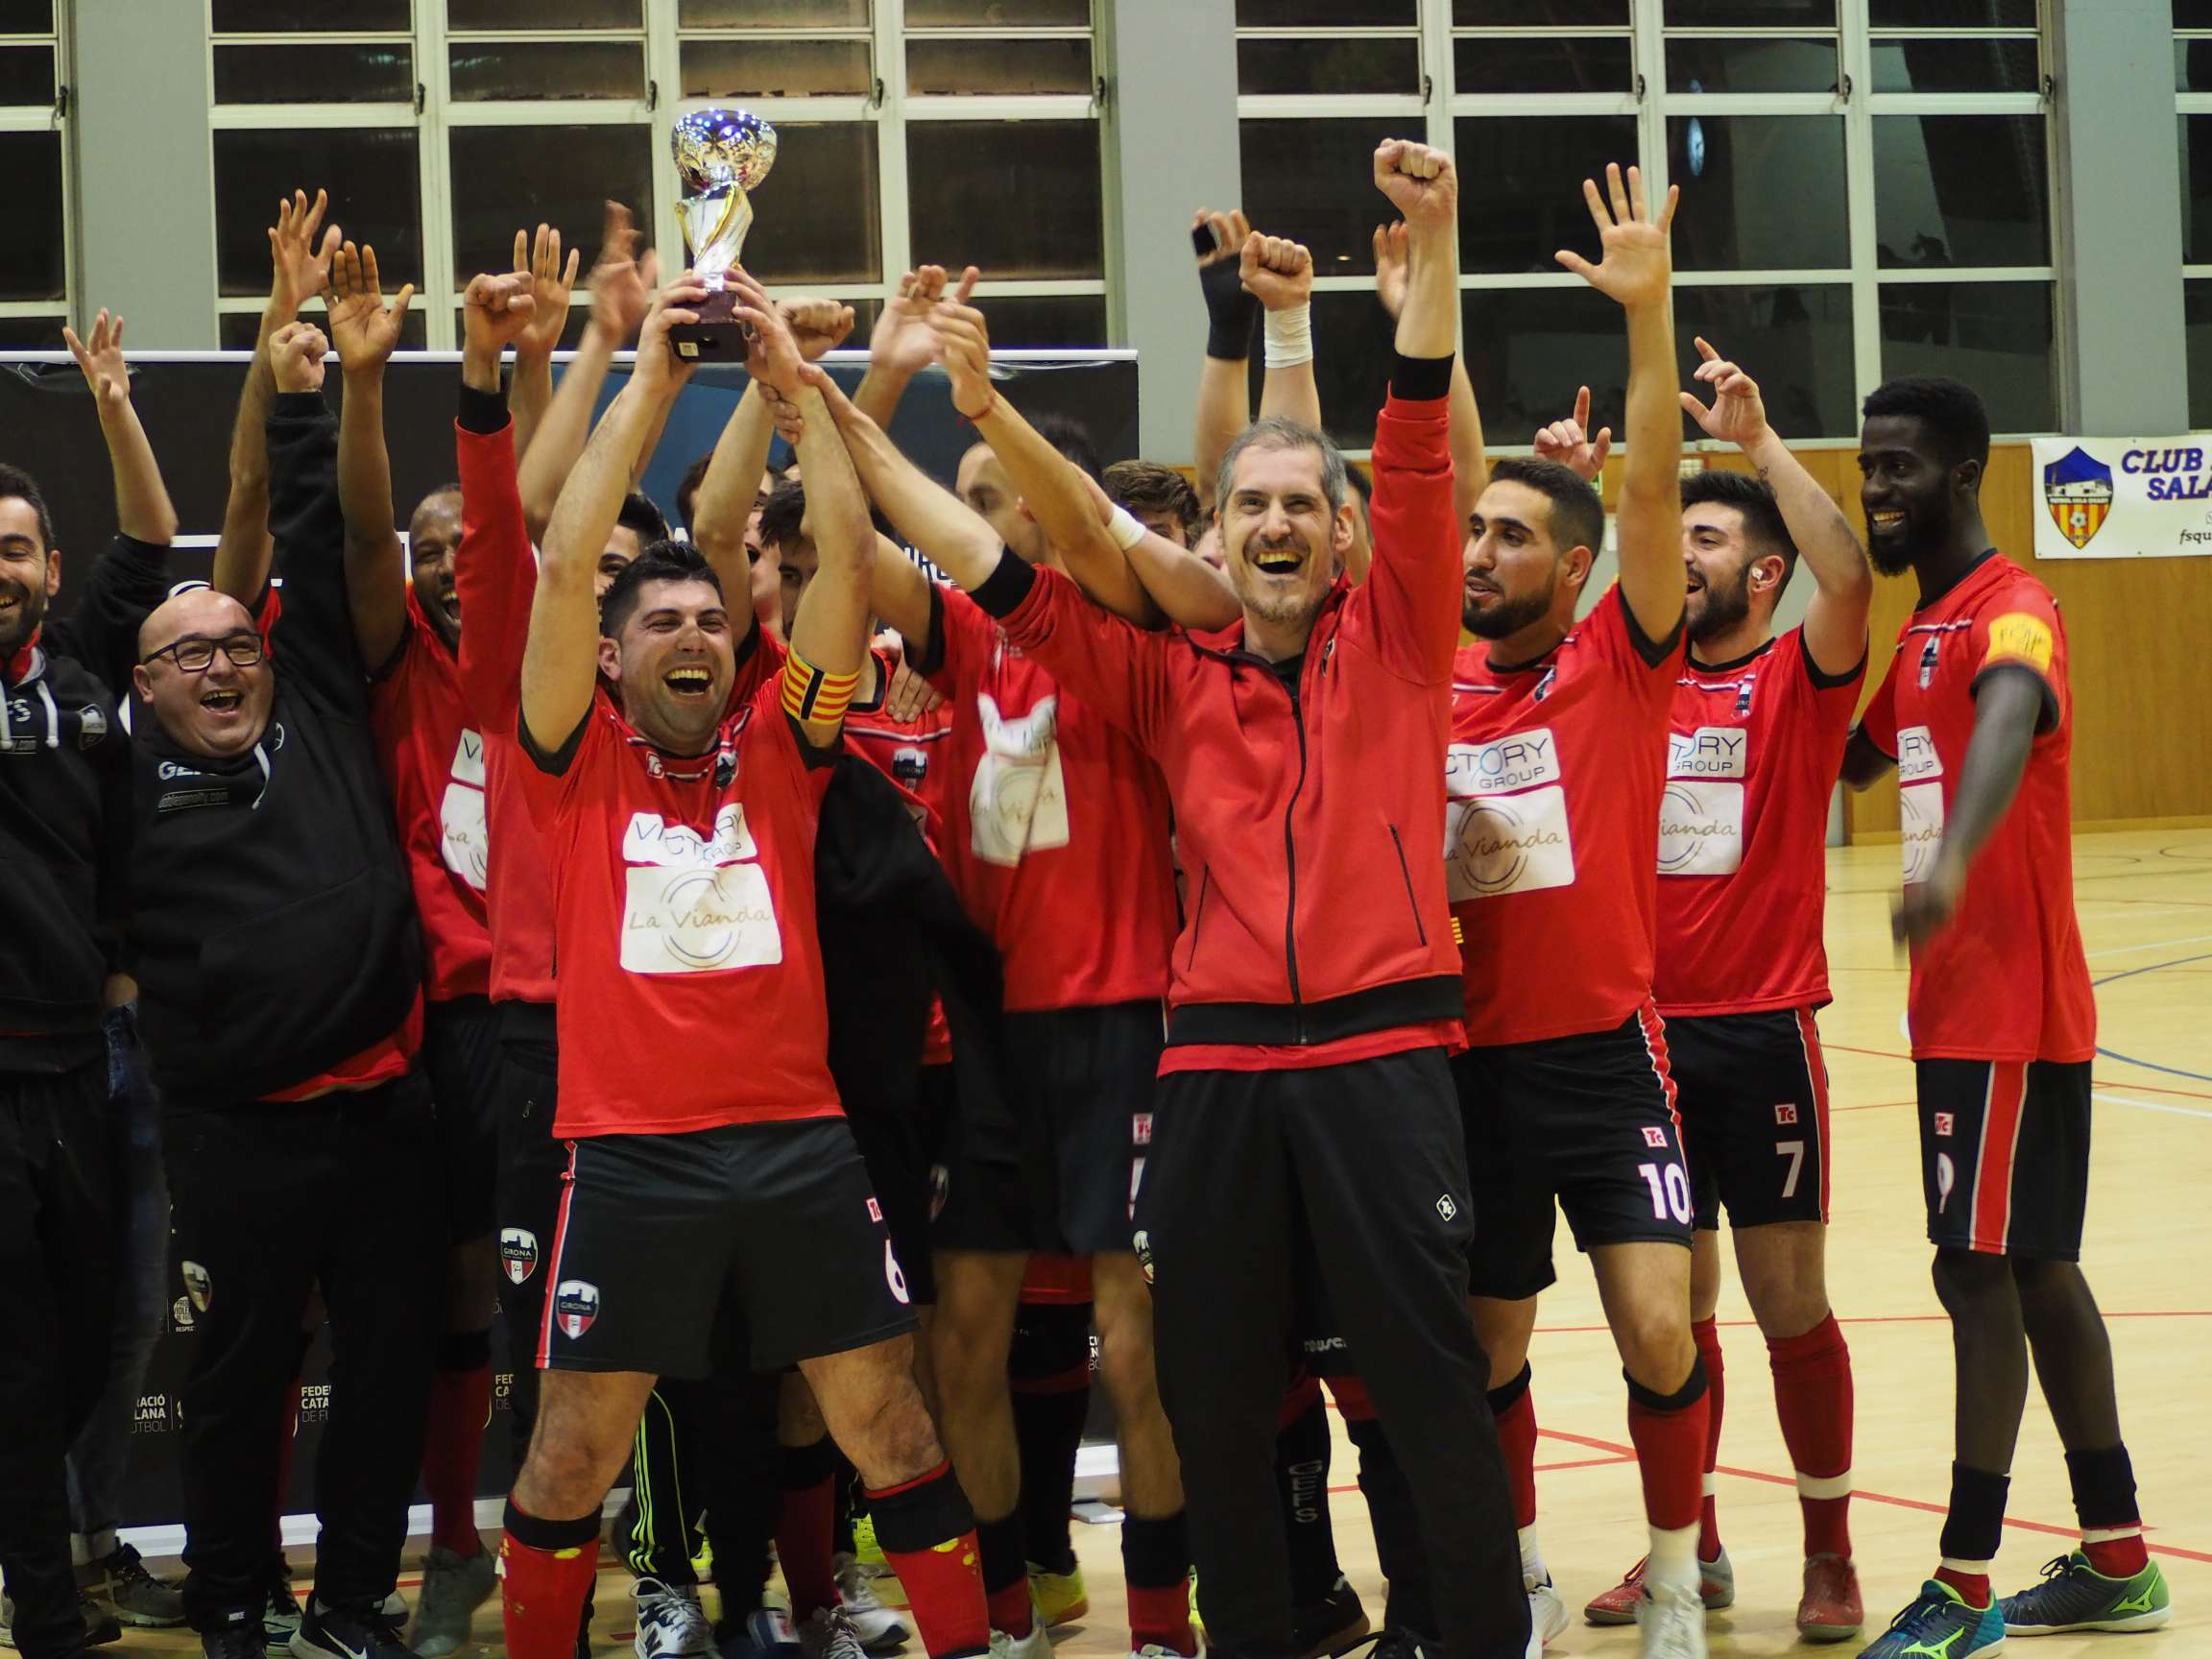 Campió Sènior Copa Girona - Girona EFS